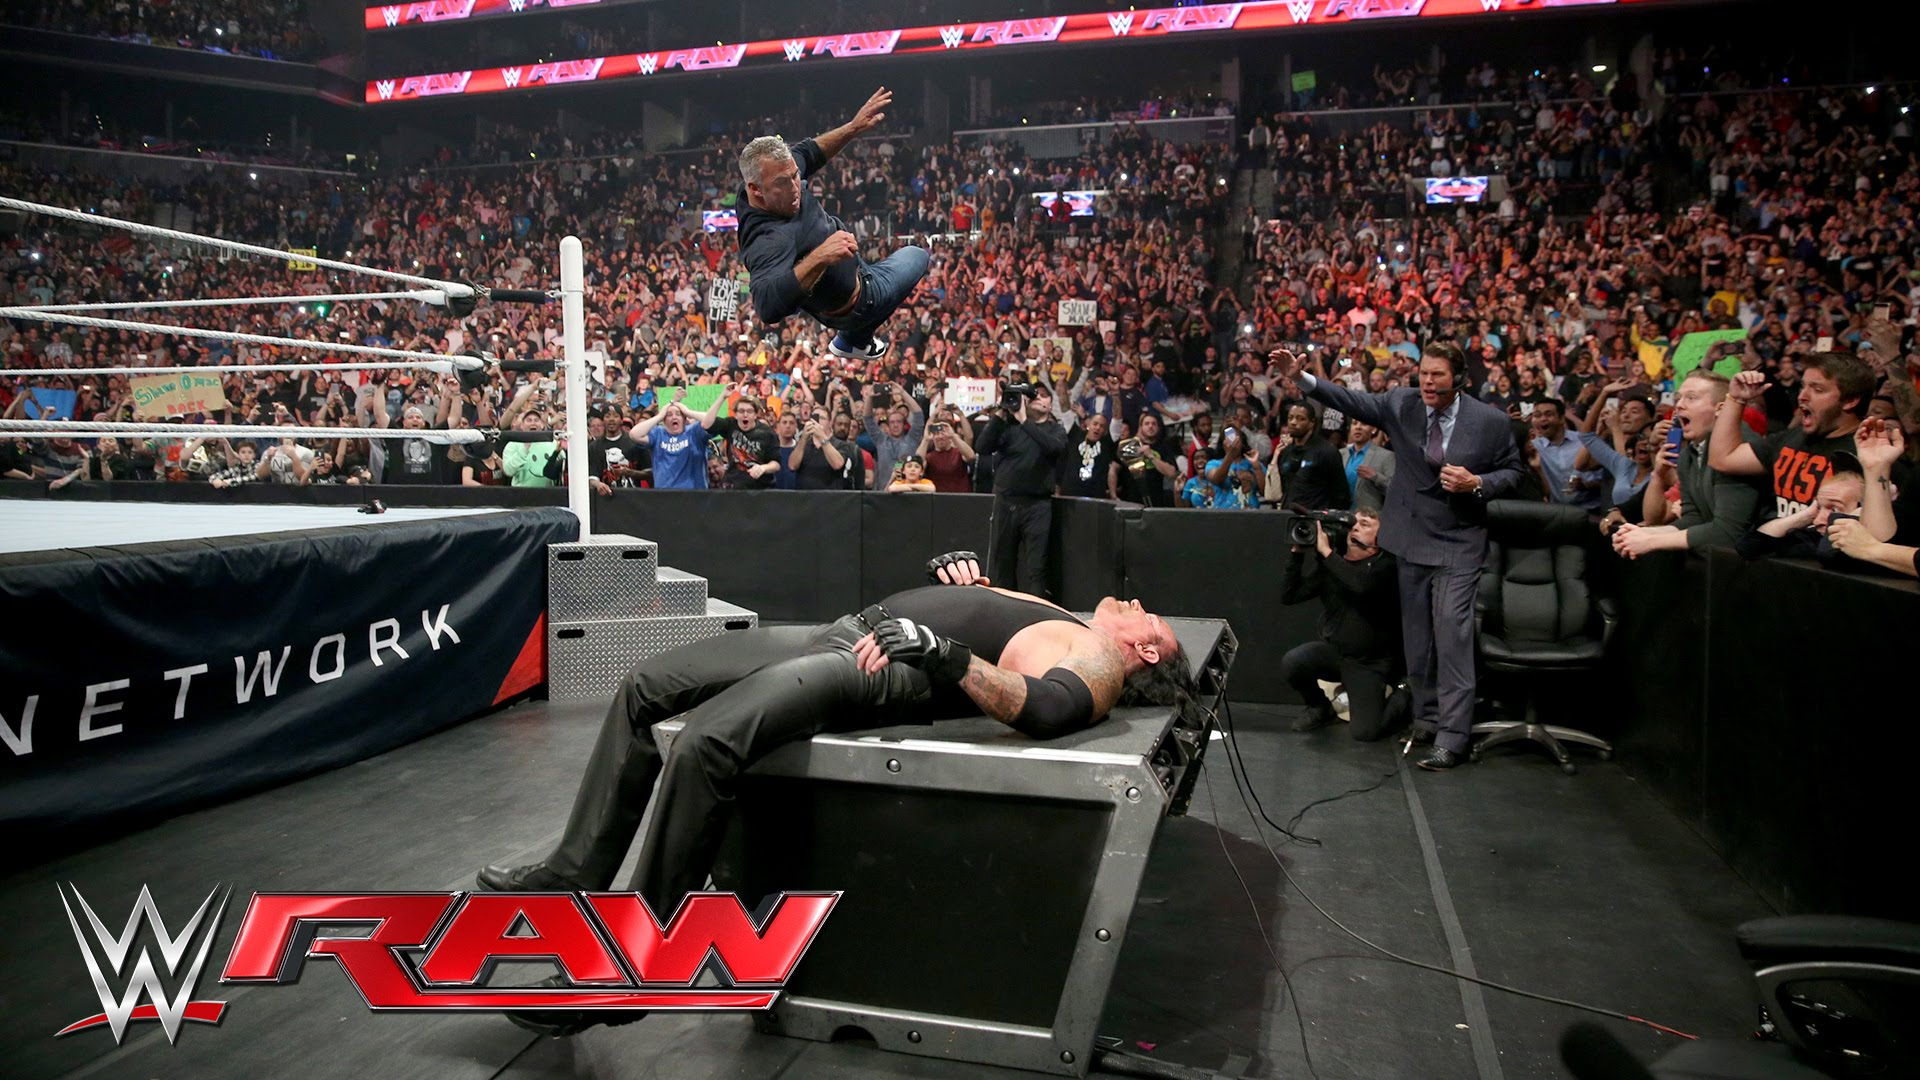 Shane McMahon elbow drops The Undertaker through table